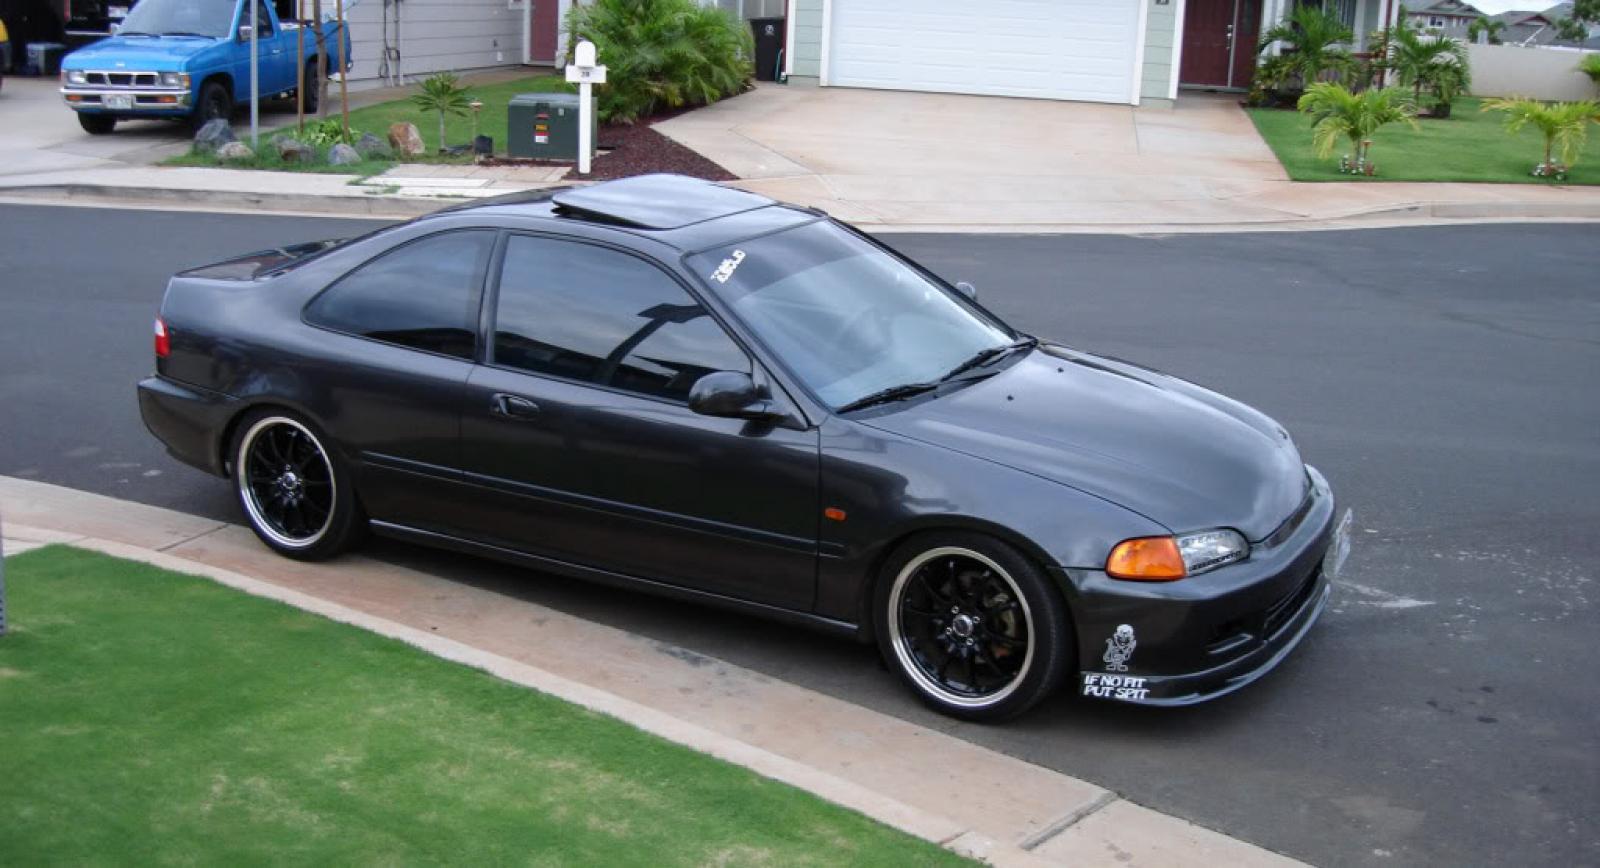 Charming 800 1024 1280 1600 Origin 1995 Honda Civic ...